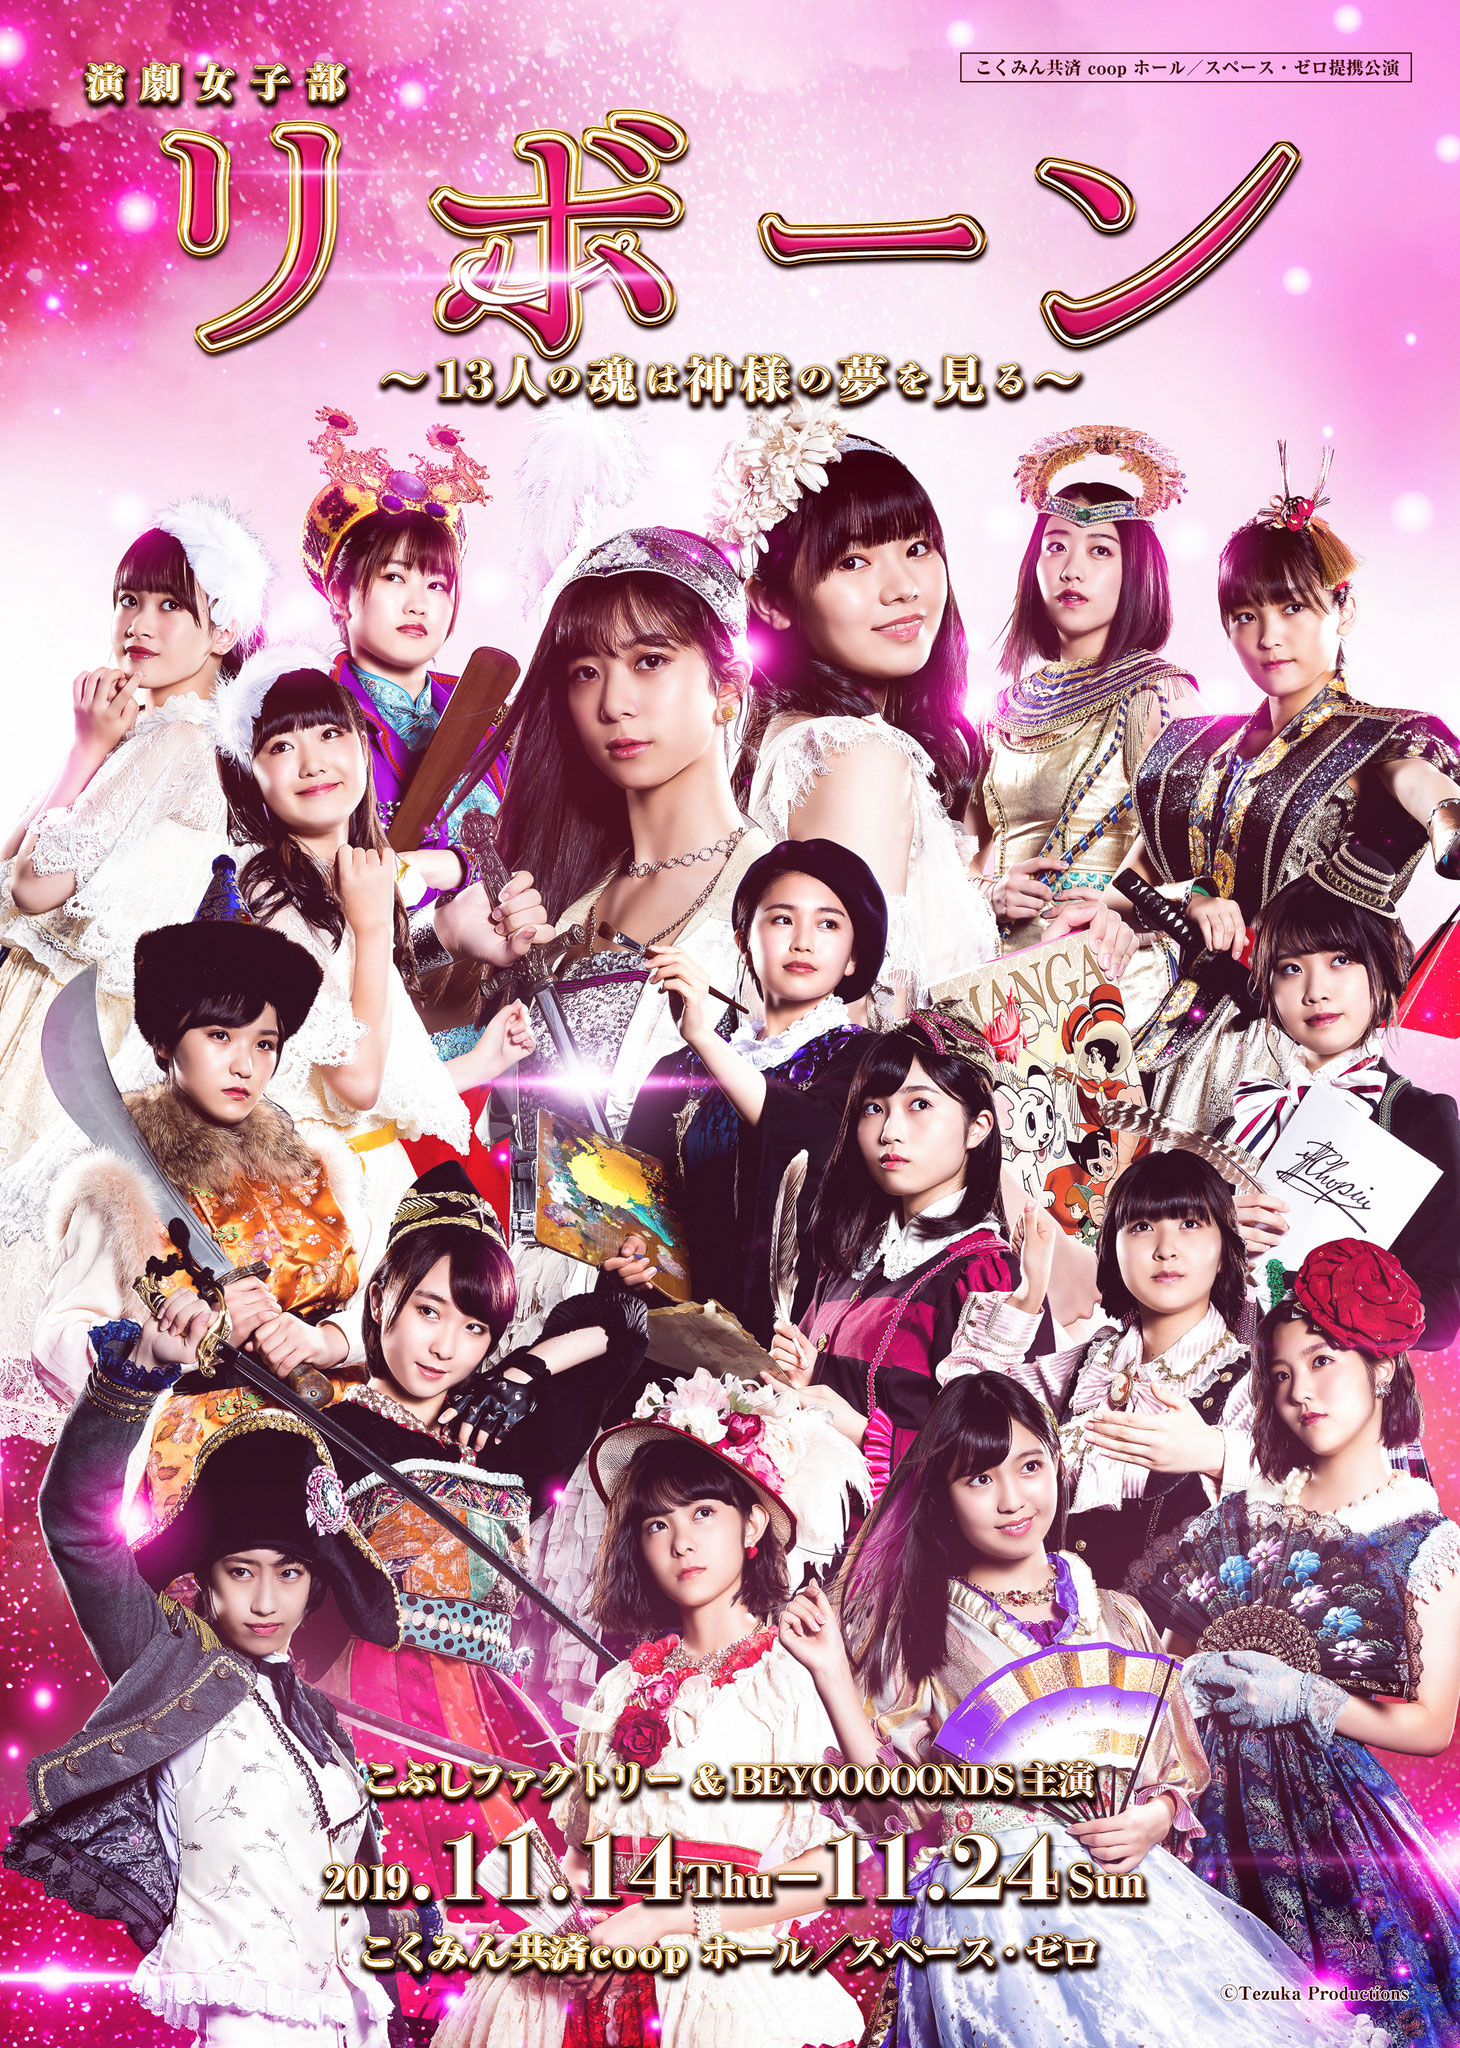 DVD ( Release: 26.02.2020)